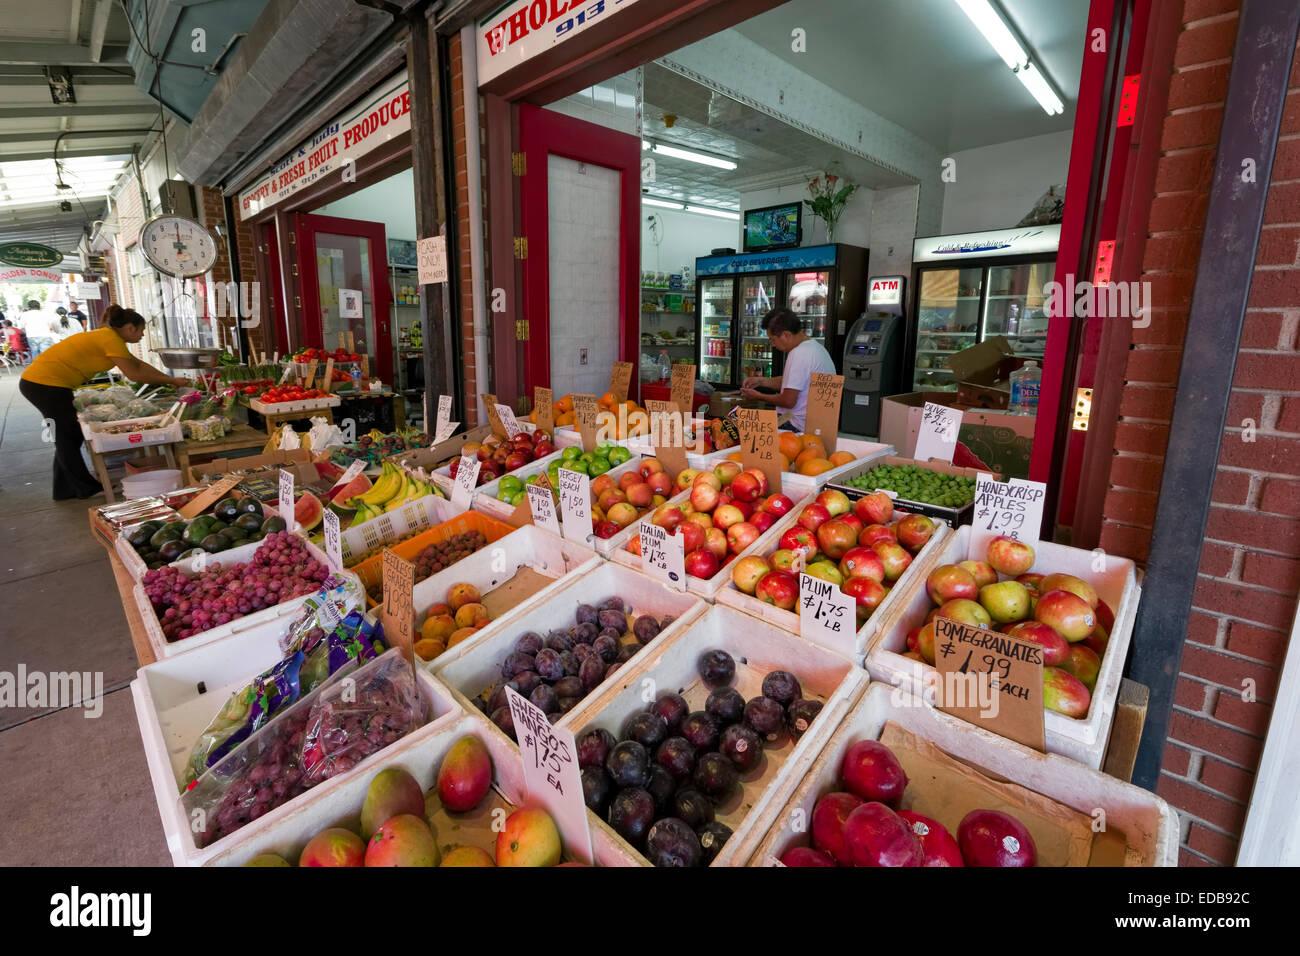 Italian Market, Philadelphia, Pennsylvania - Stock Image